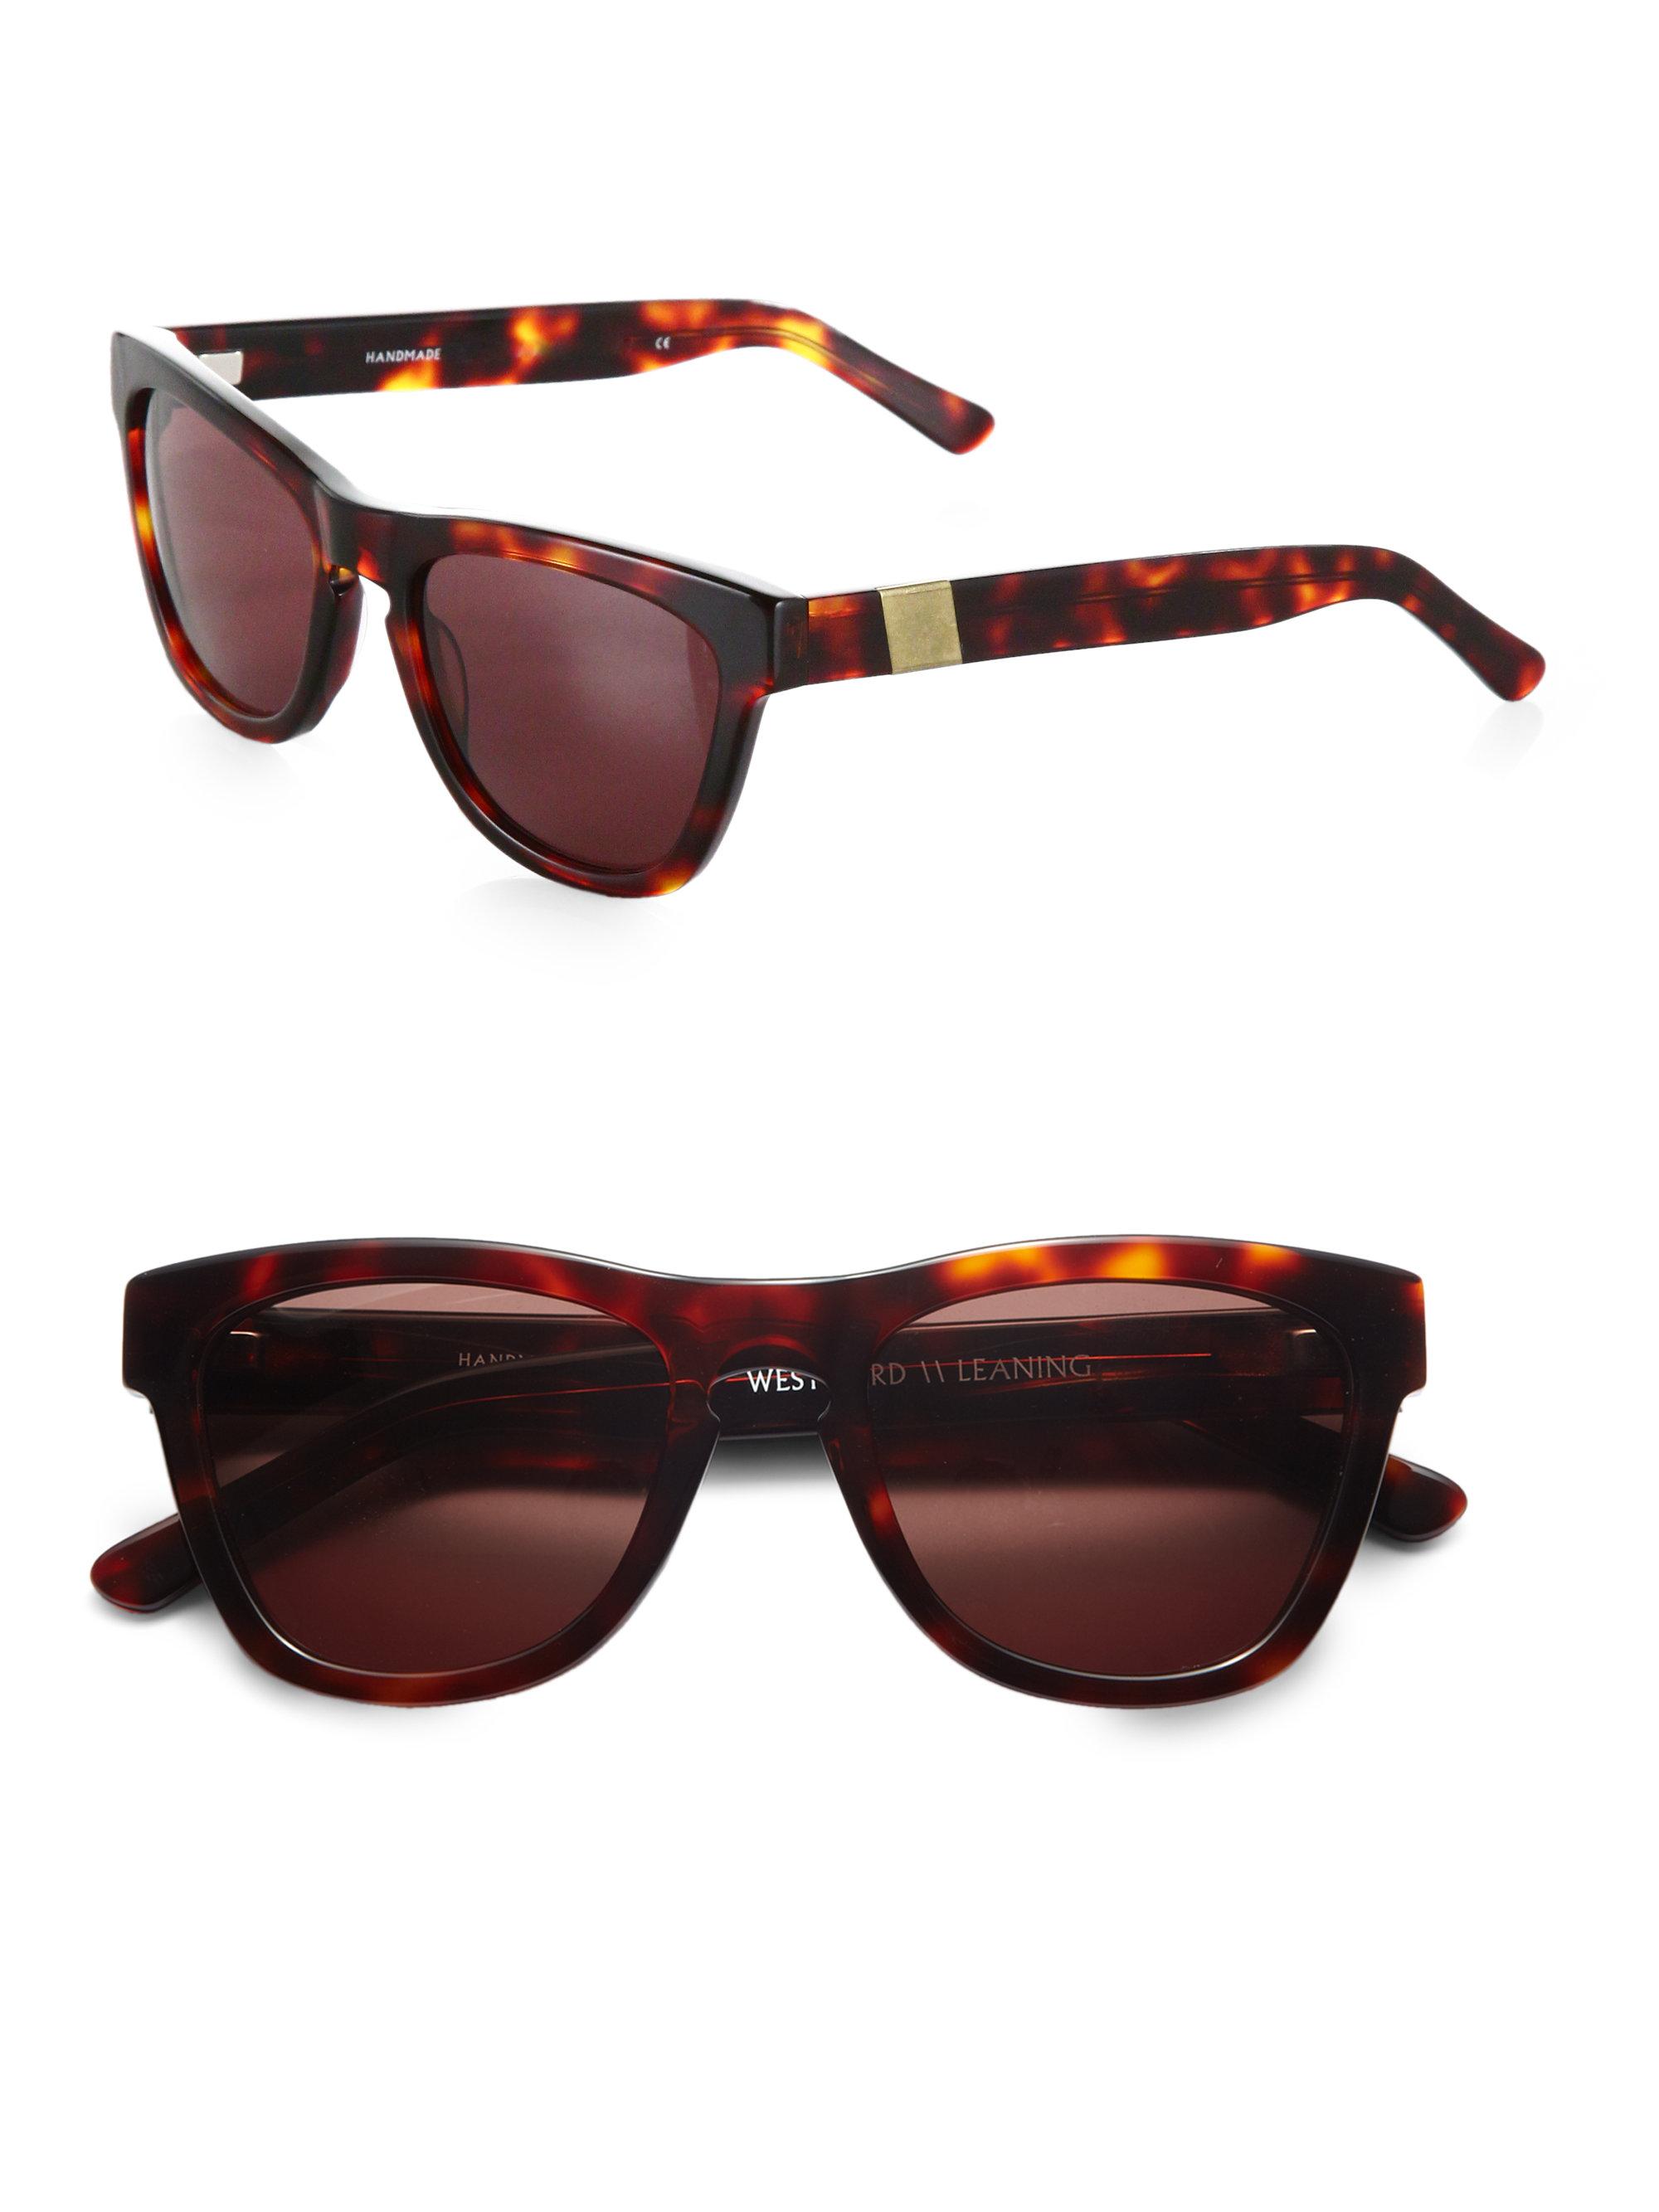 25301eb18fb Lyst - Westward Leaning Louisiana Purchase Acetate Square Sunglasses